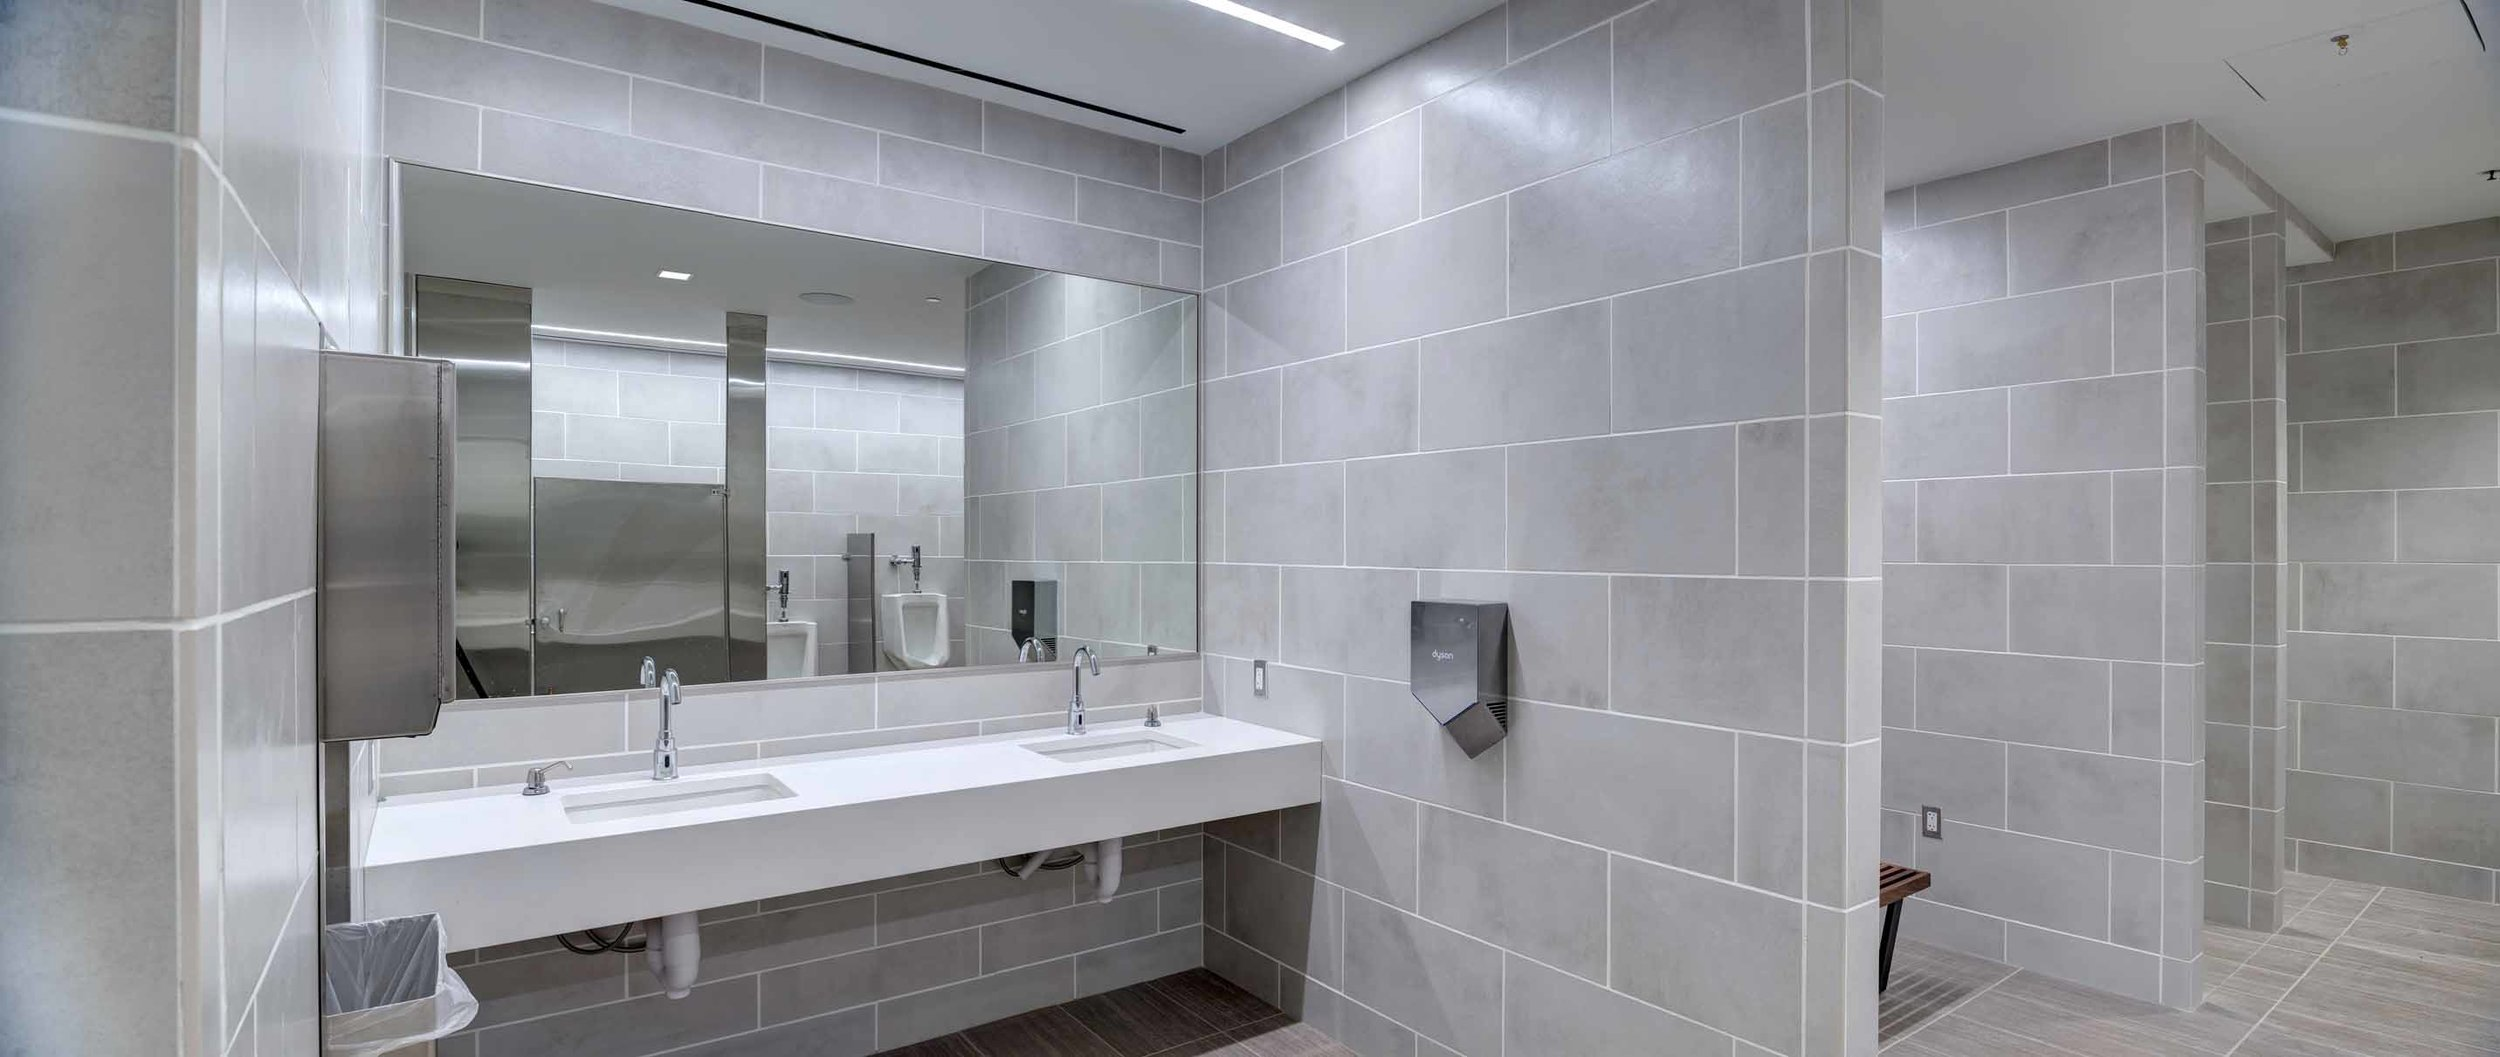 1stFloor-Showers-9888-ConsumersCreditUnion-QuarterSize[1].jpg